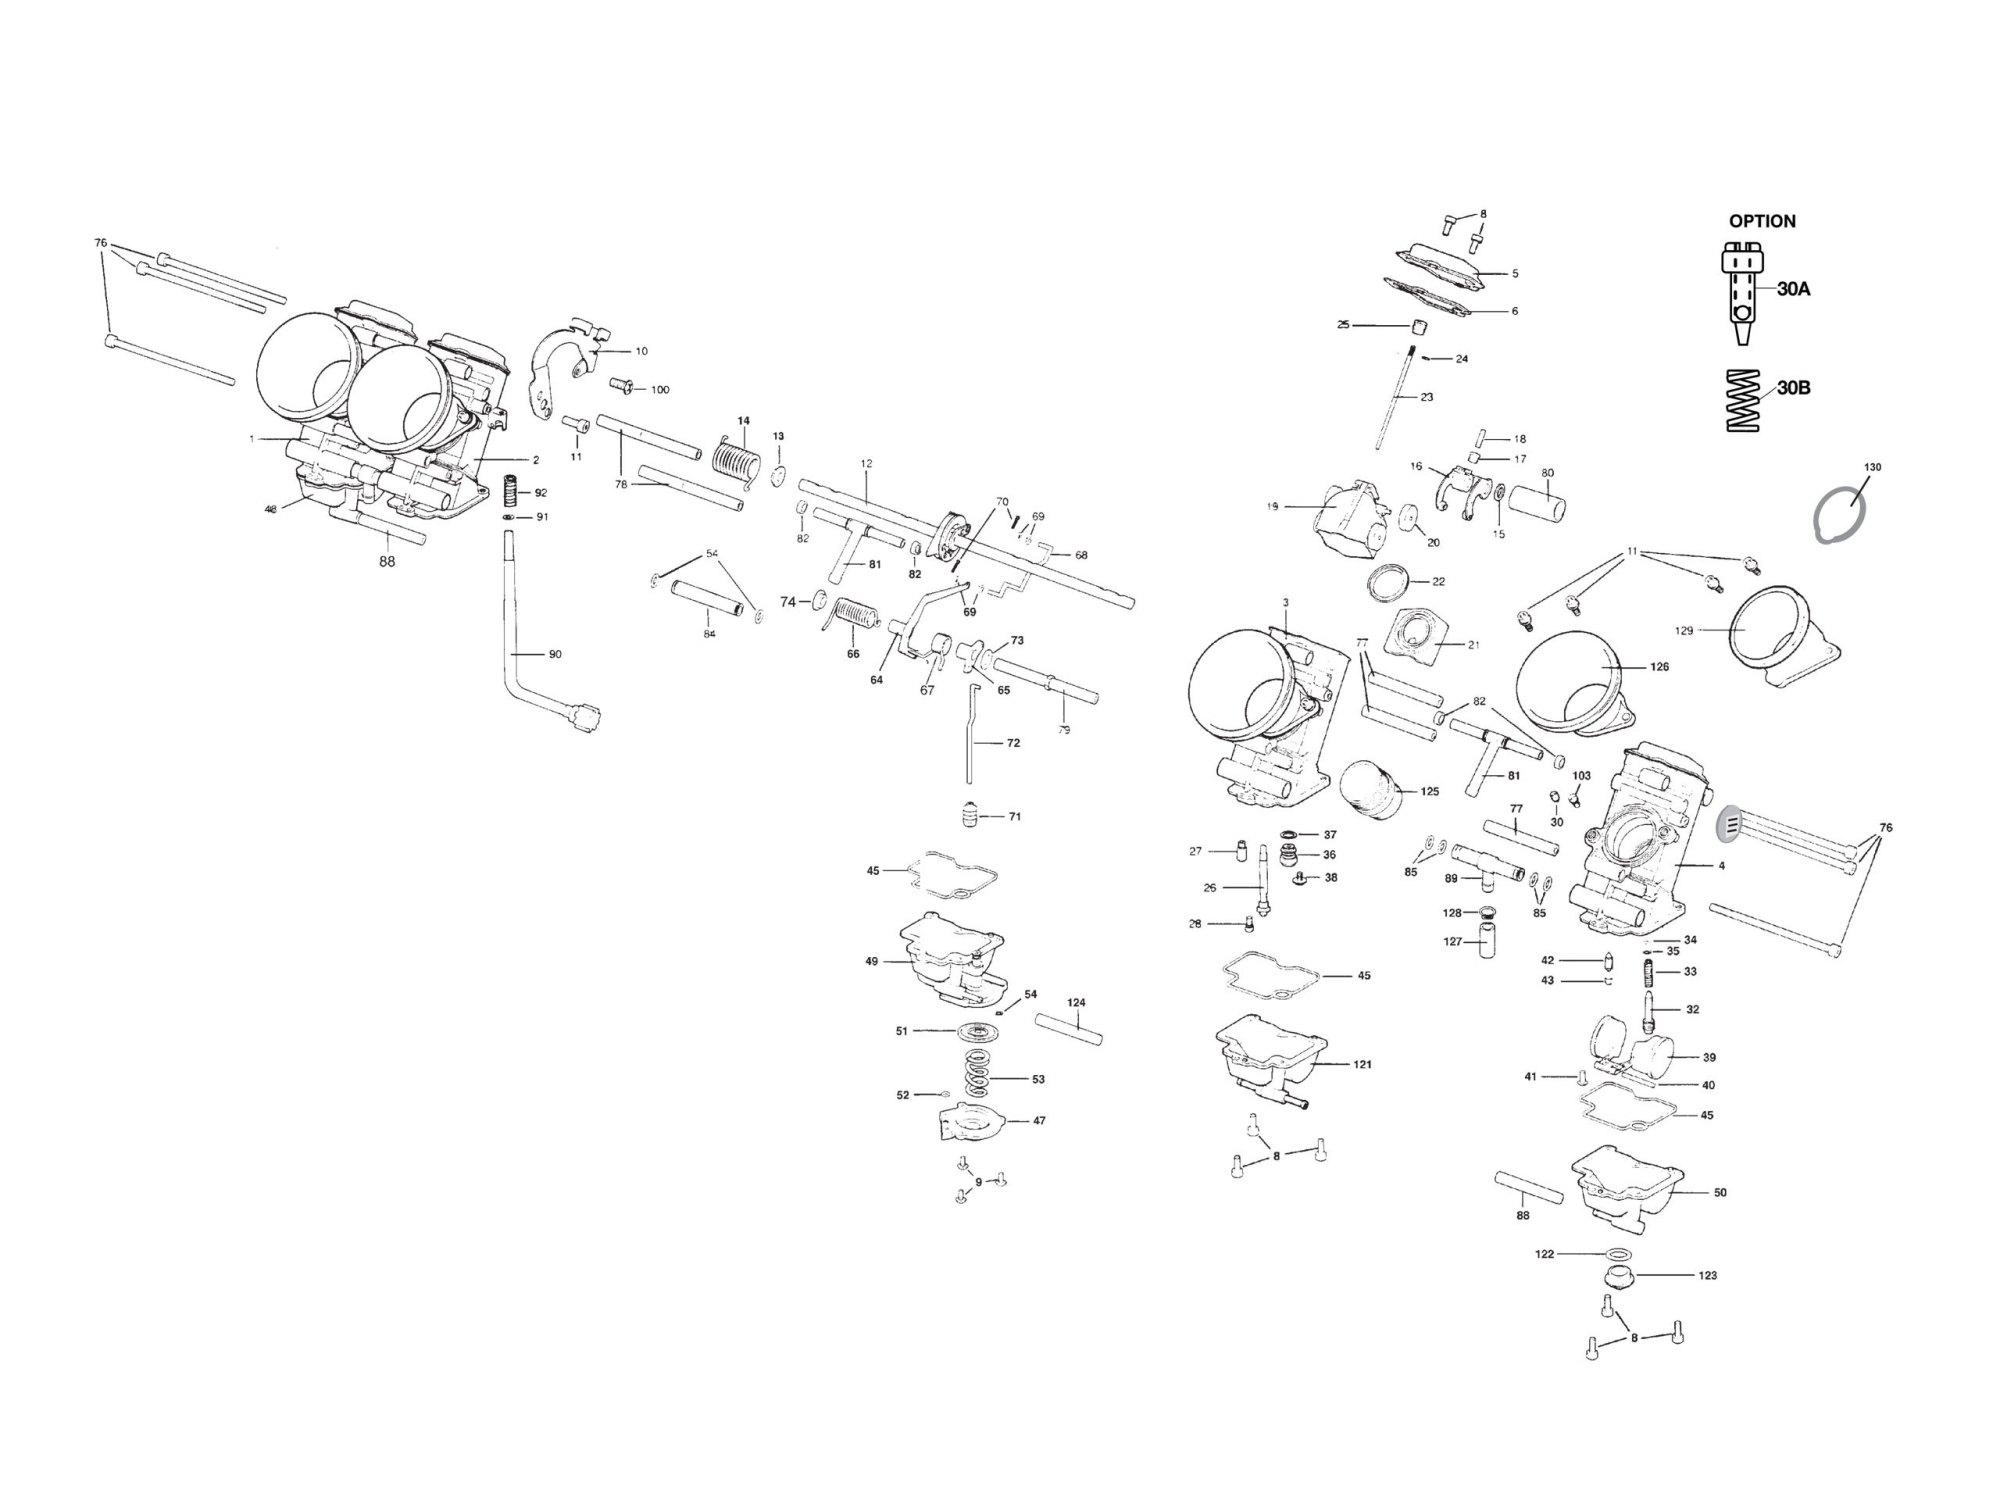 Drz 400 Part Diagram - ltz 400 parts diagram suzuki ltz 400